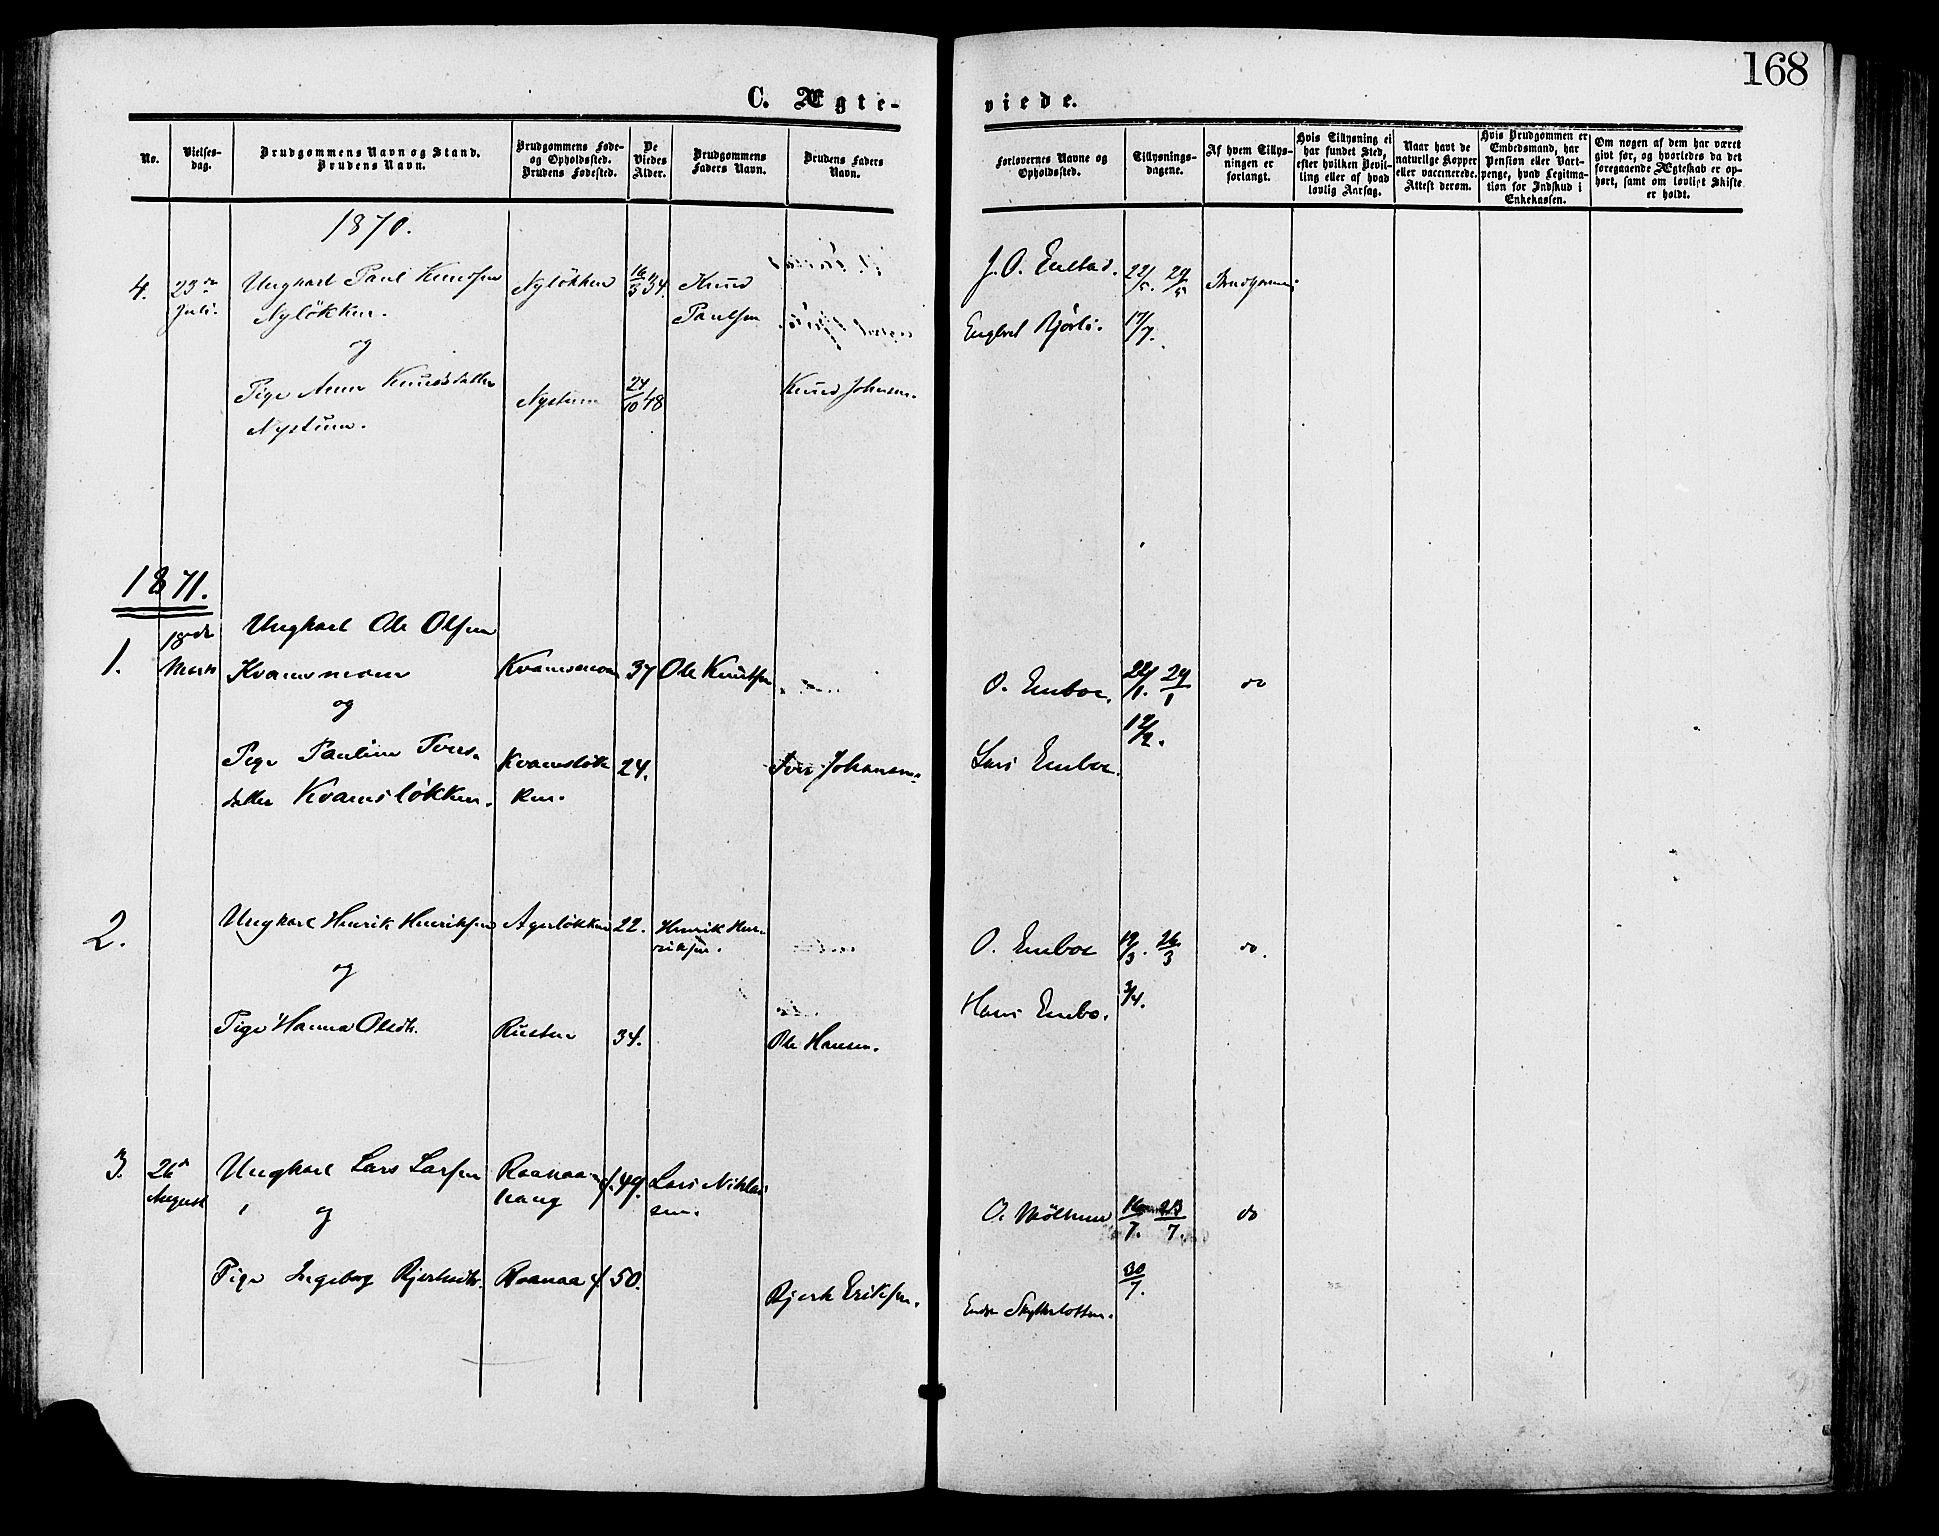 SAH, Lesja prestekontor, Ministerialbok nr. 9, 1854-1889, s. 168